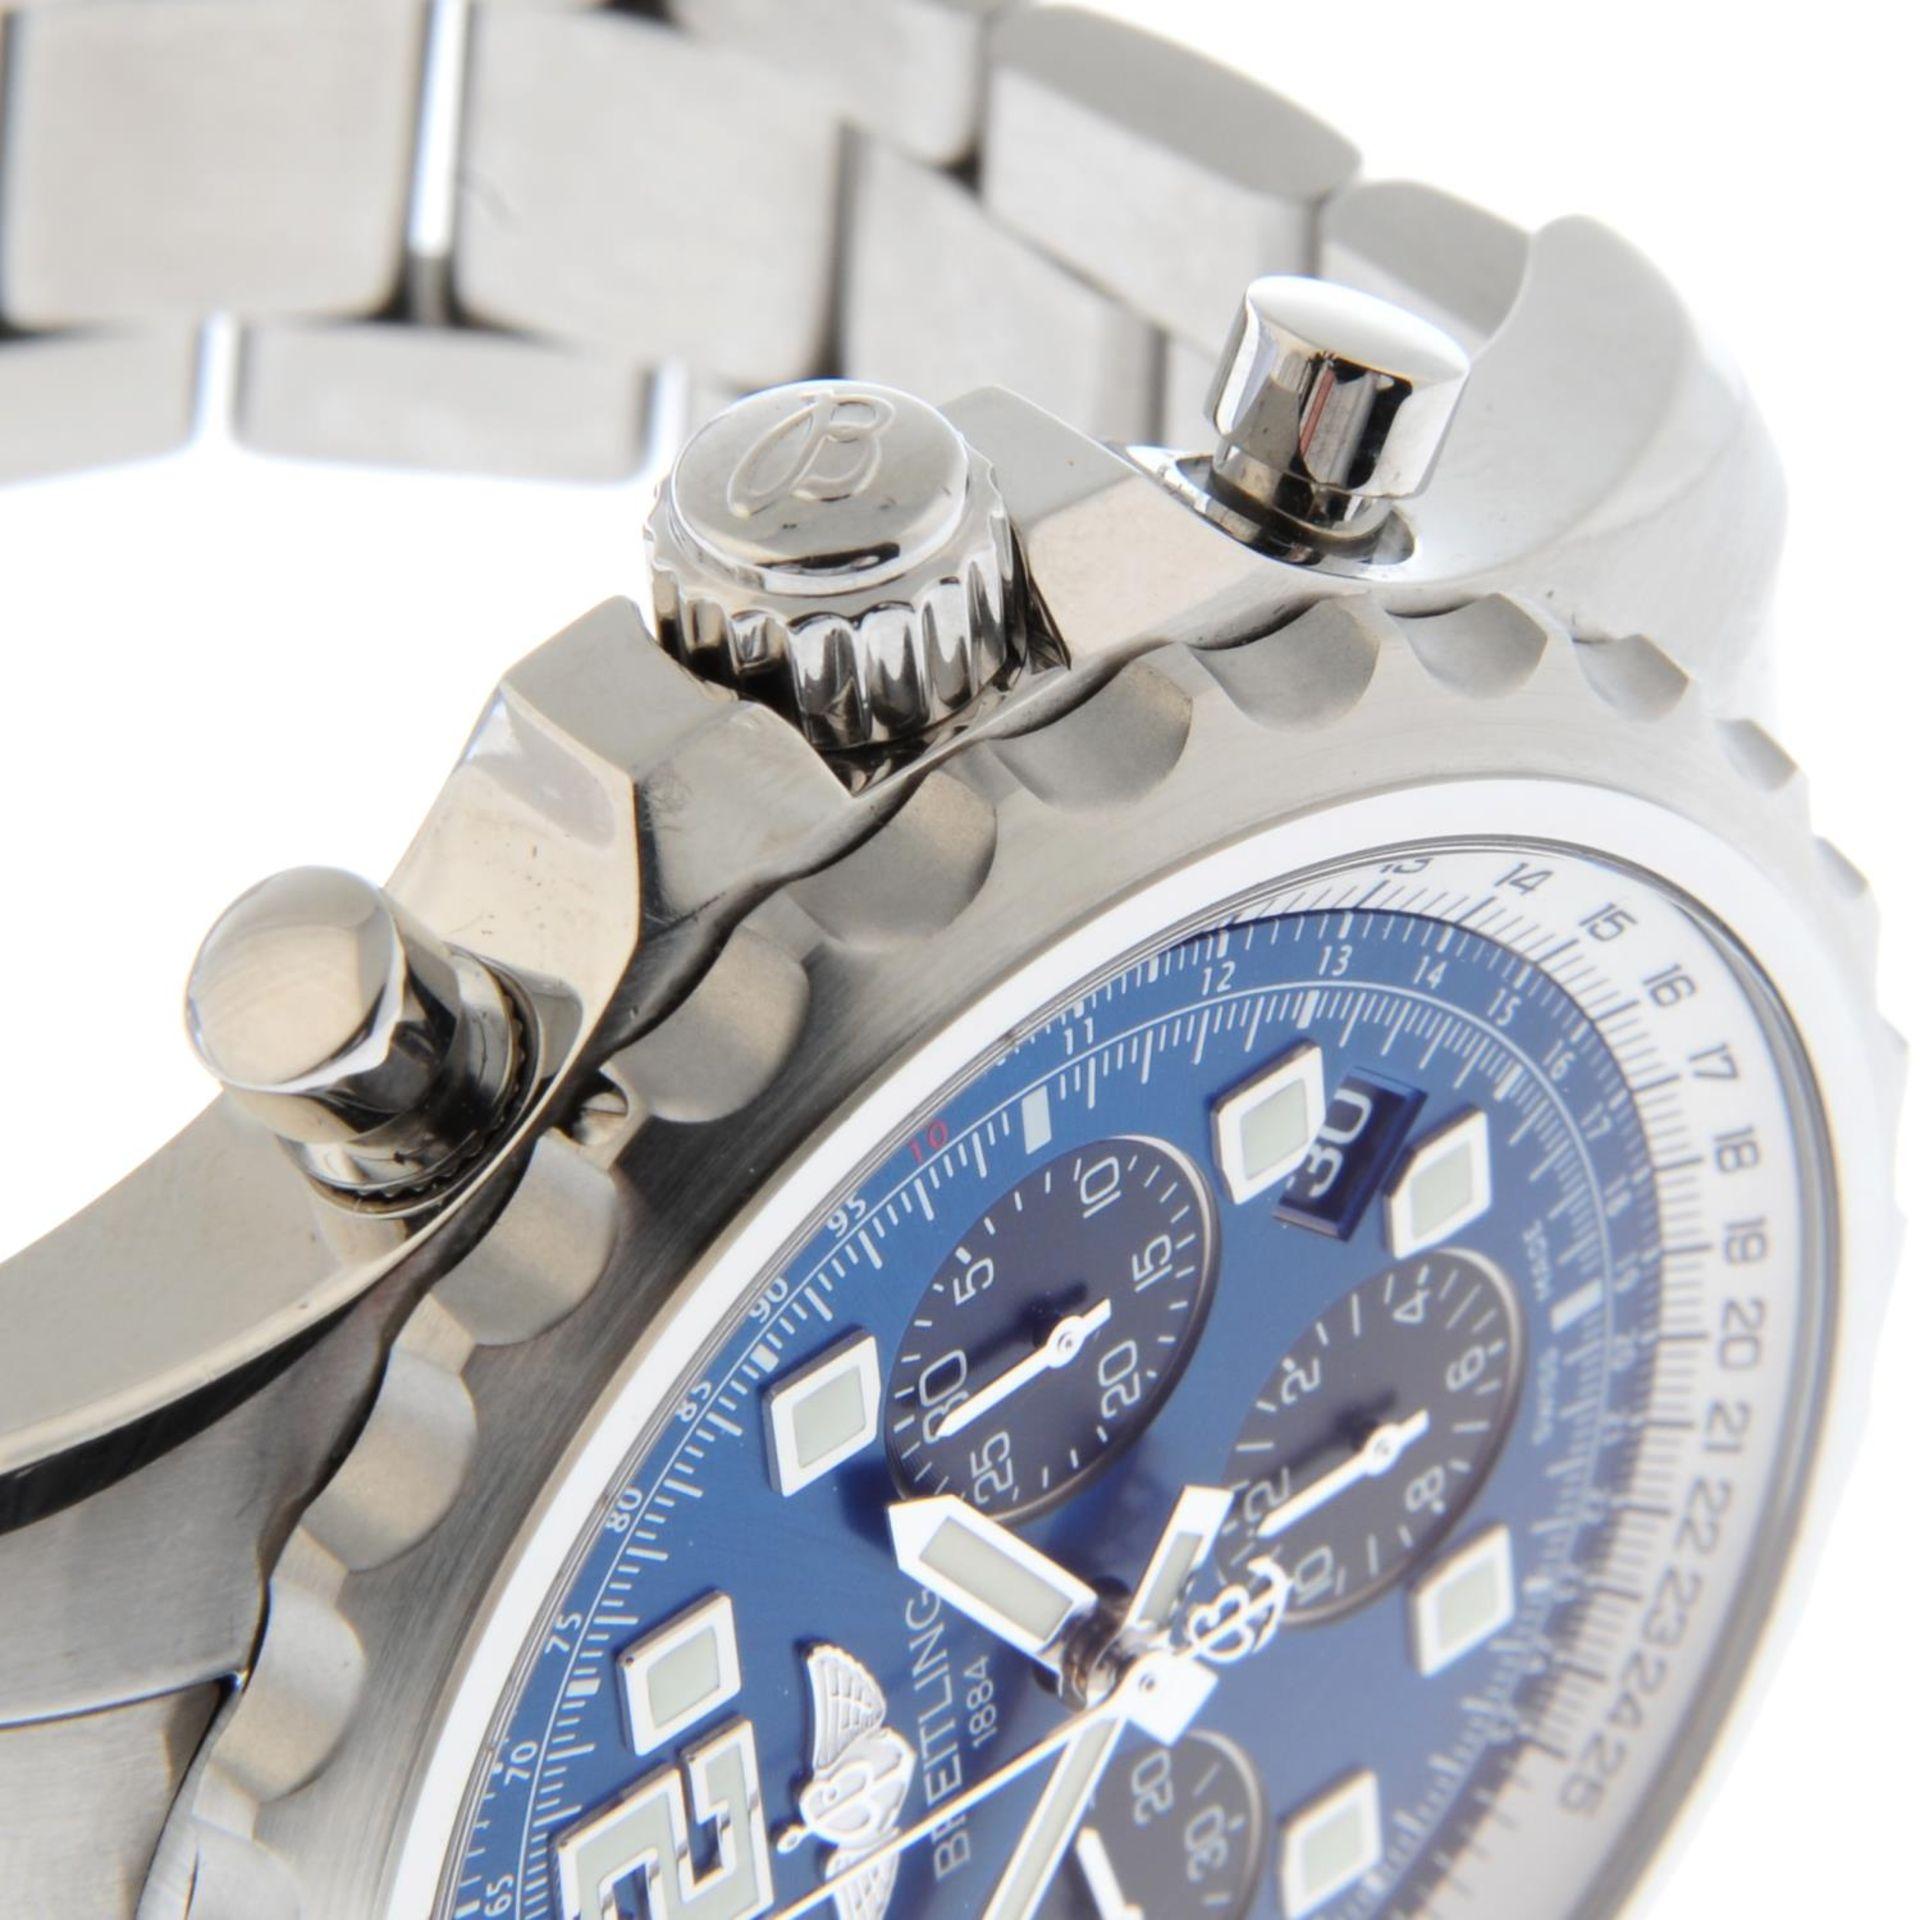 BREITLING - a Chronospace chronograph bracelet watch. - Bild 5 aus 5